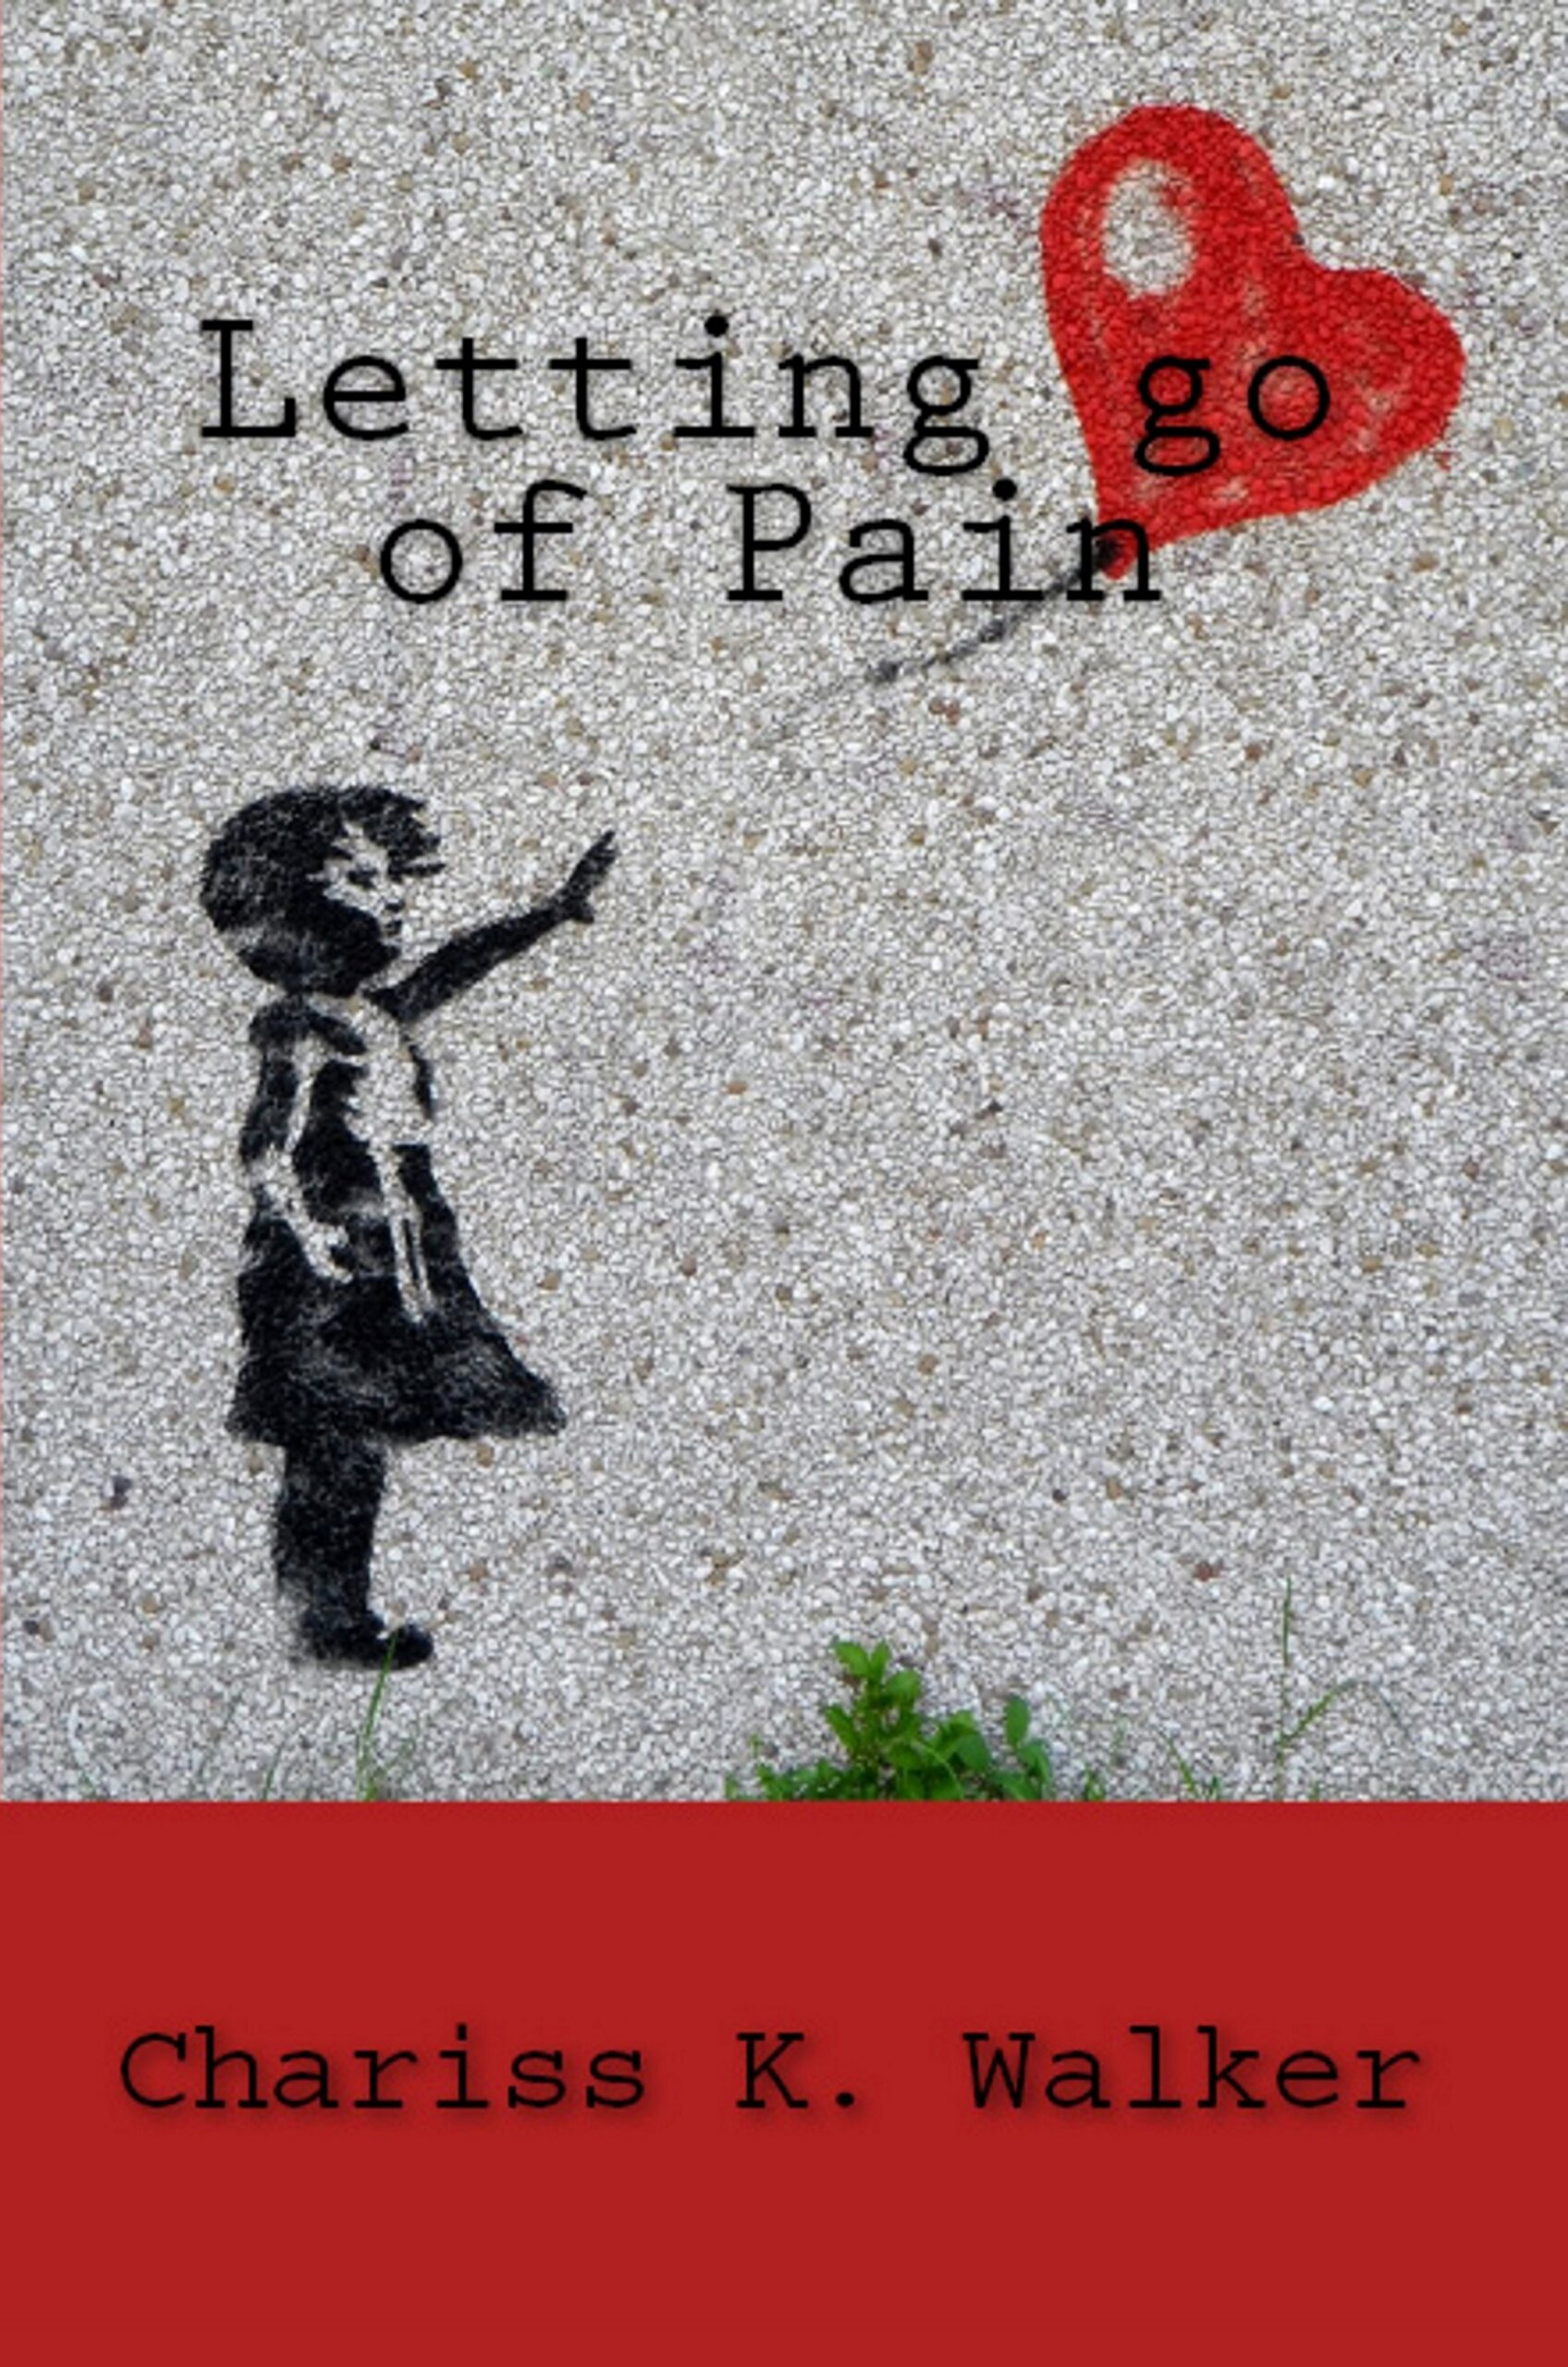 Letting_Go_of_Pain.jpg